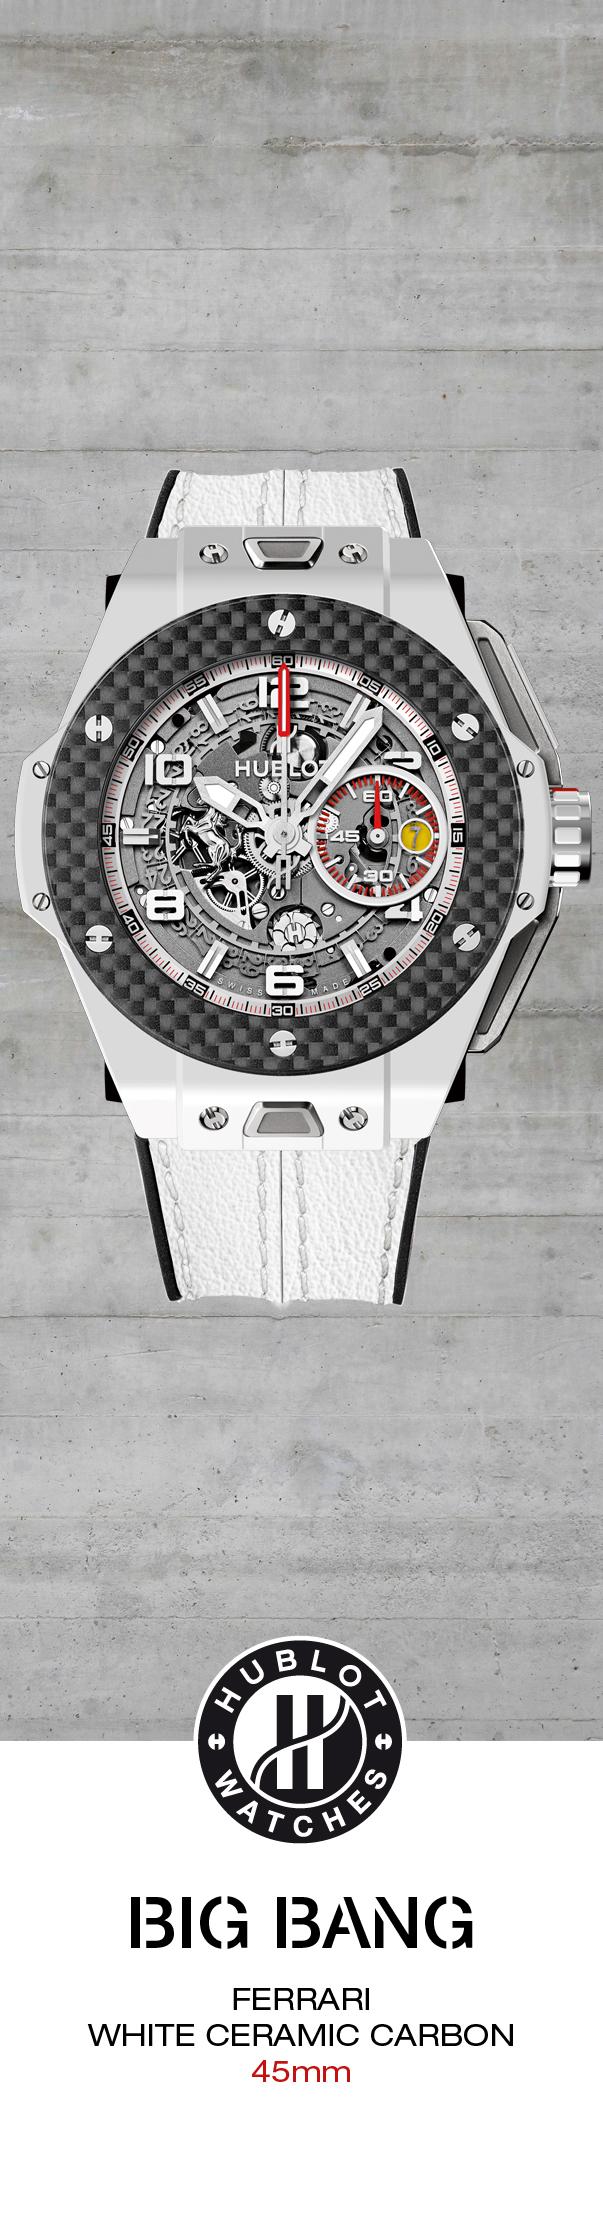 #Hublot Big Bang Ferrari White Ceramic Carbon - Limited Edition